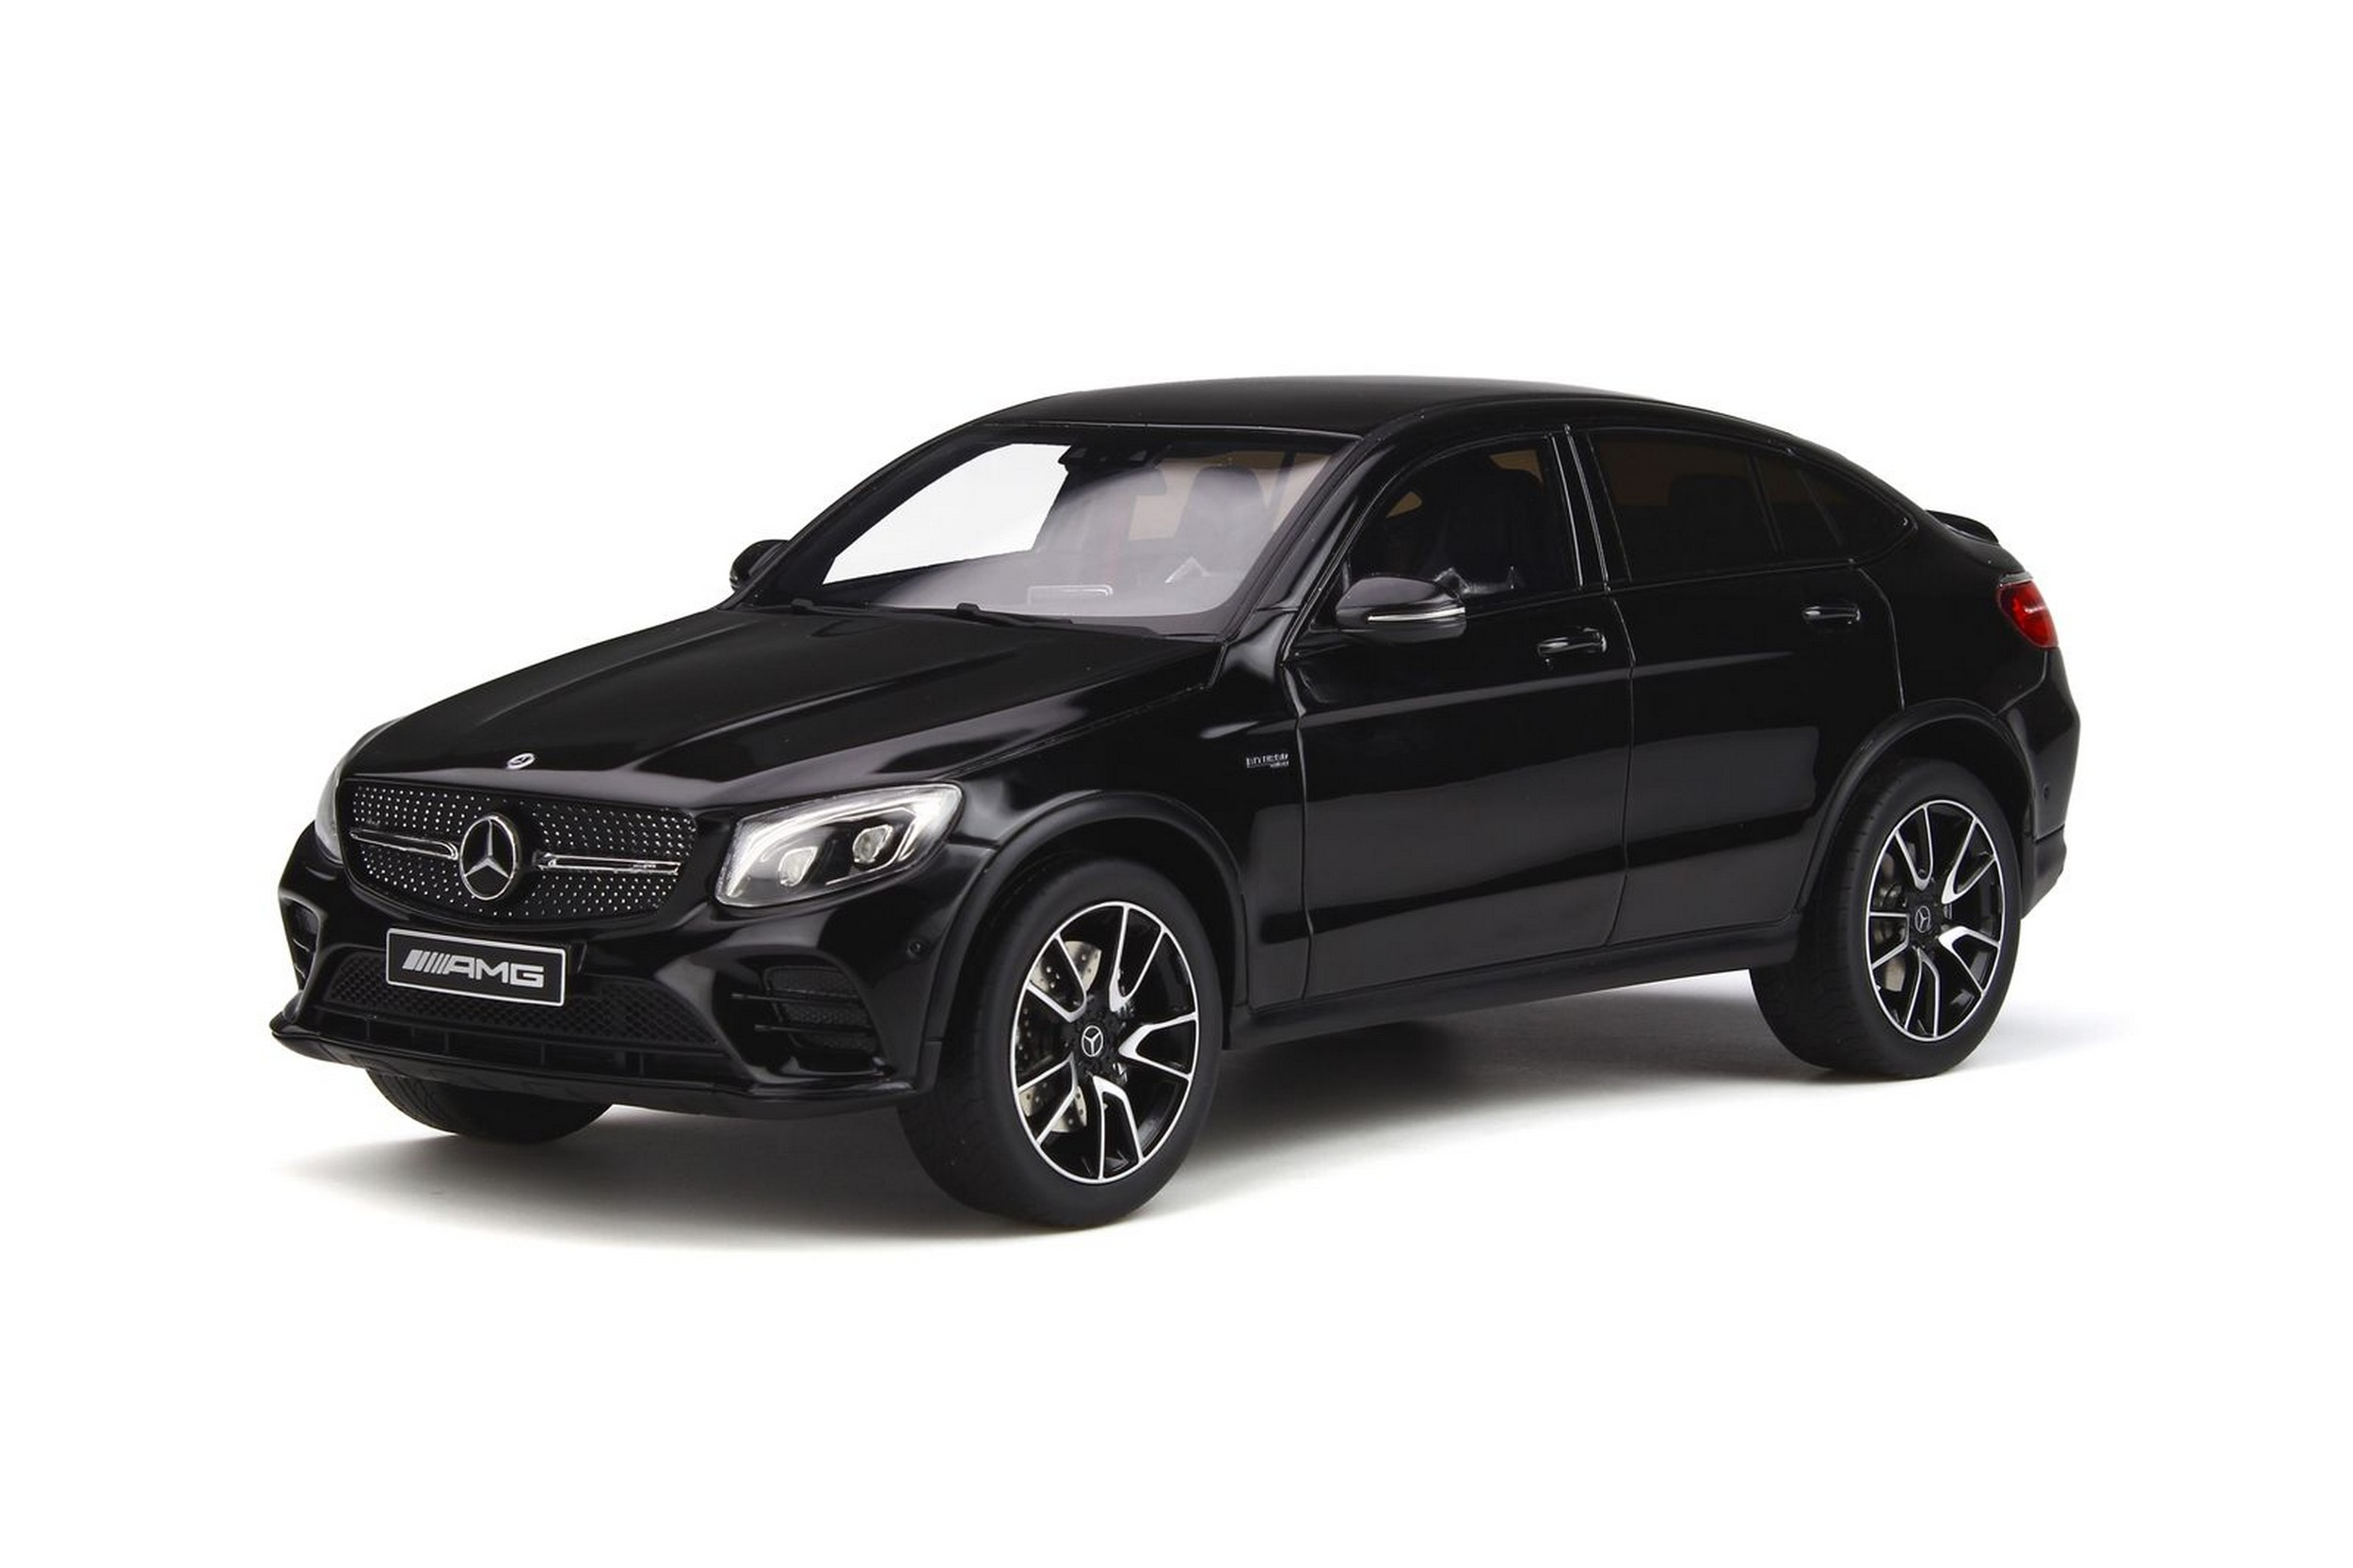 mercedes amg glc 43 coup 2019 model car collection gt. Black Bedroom Furniture Sets. Home Design Ideas